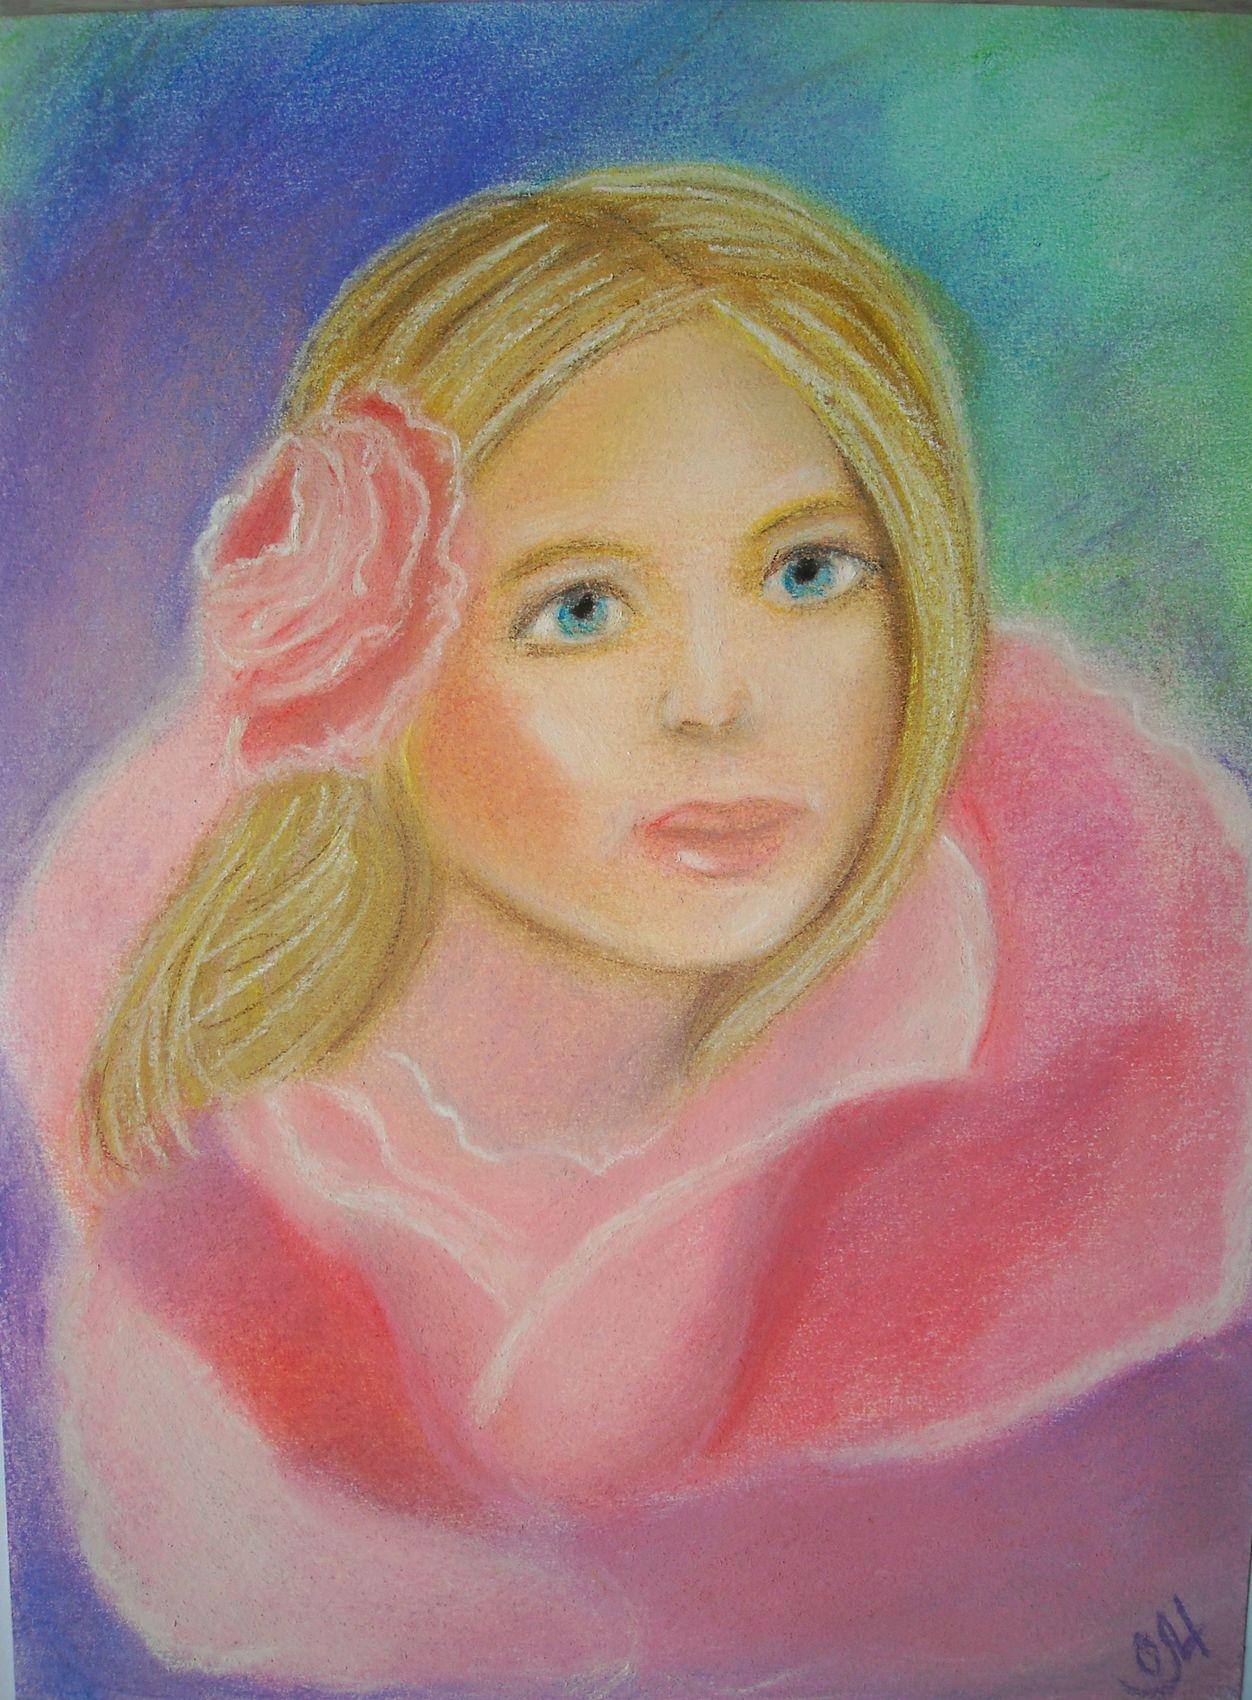 dessin dessin au pastel sec rose tendresse portrait f minin romantique. Black Bedroom Furniture Sets. Home Design Ideas